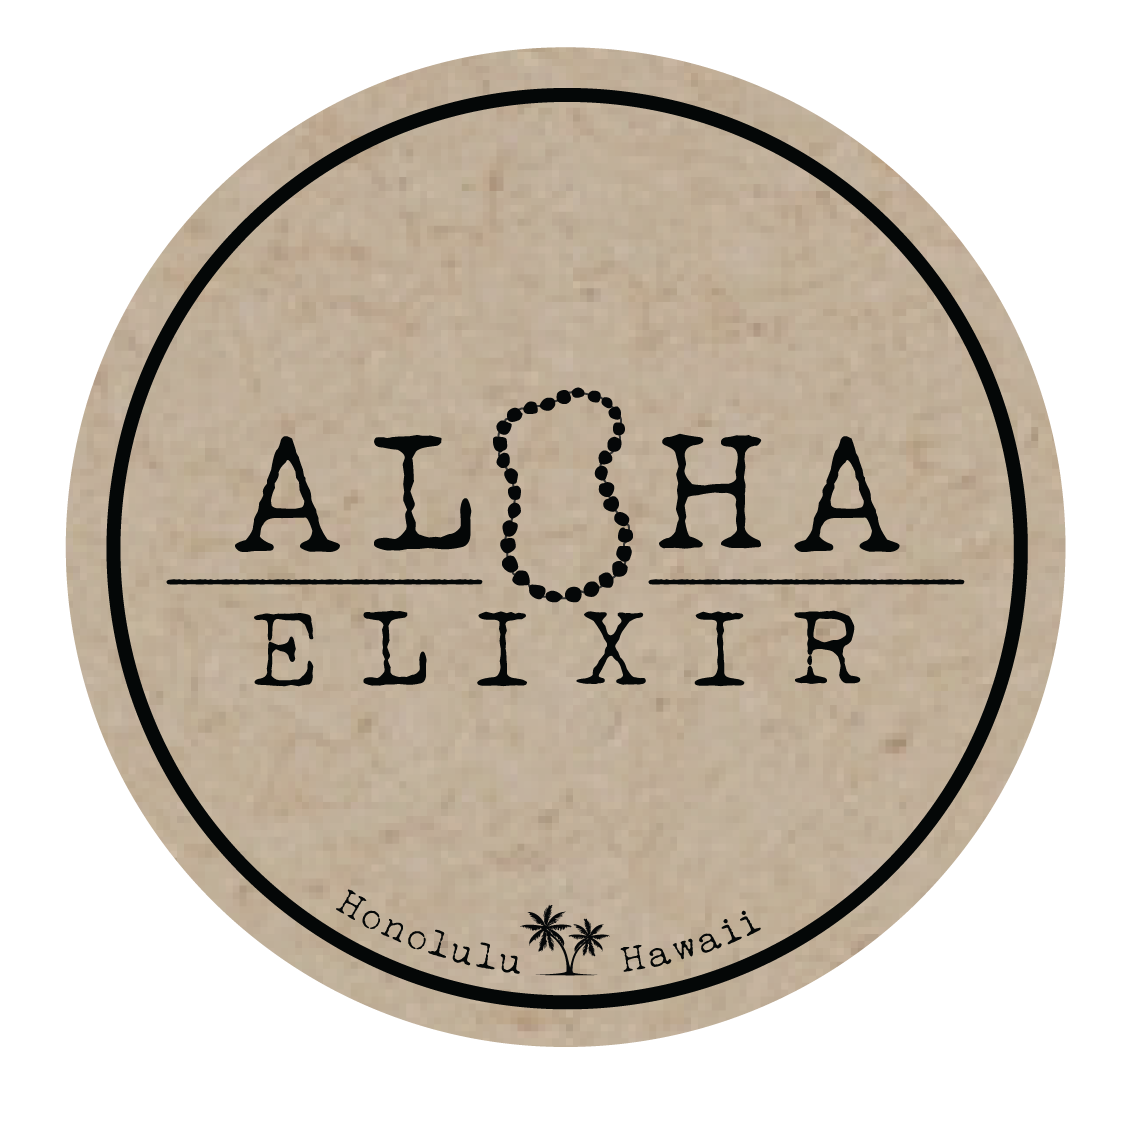 AlohaElixir